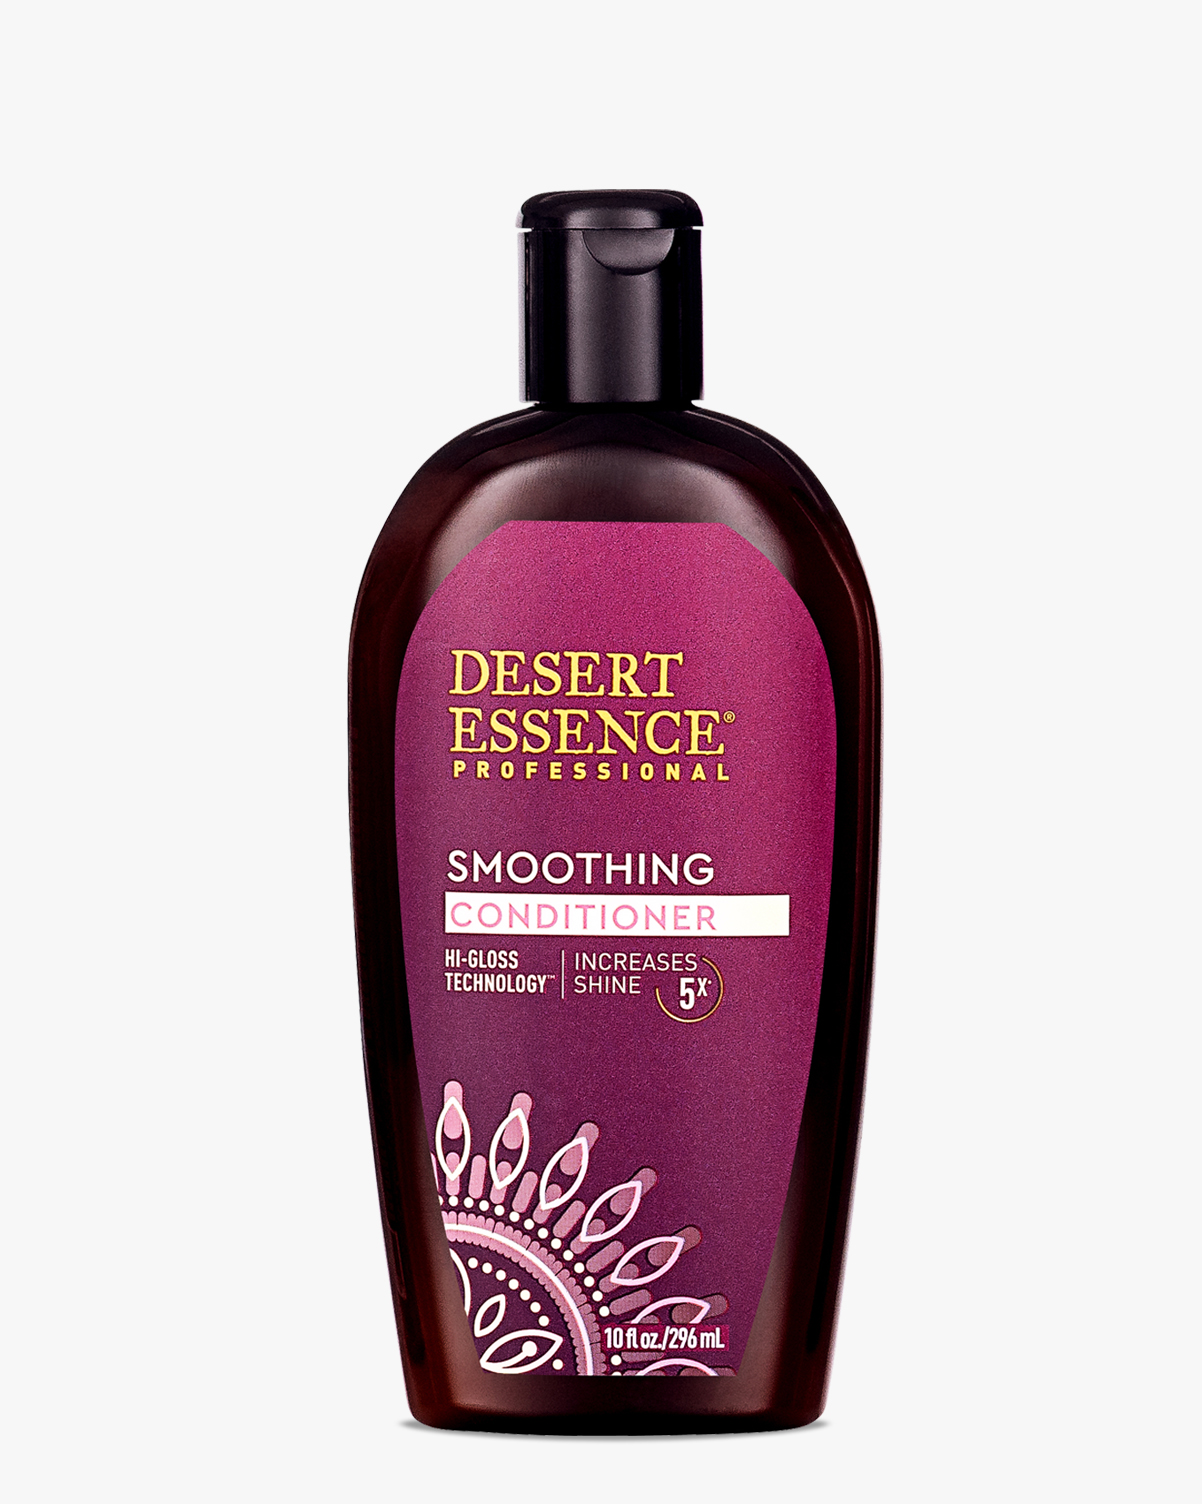 Desert Essence coupon: Desert Essence Smoothing Conditioner, 10 fl. oz. | Vegan | Gluten-Free